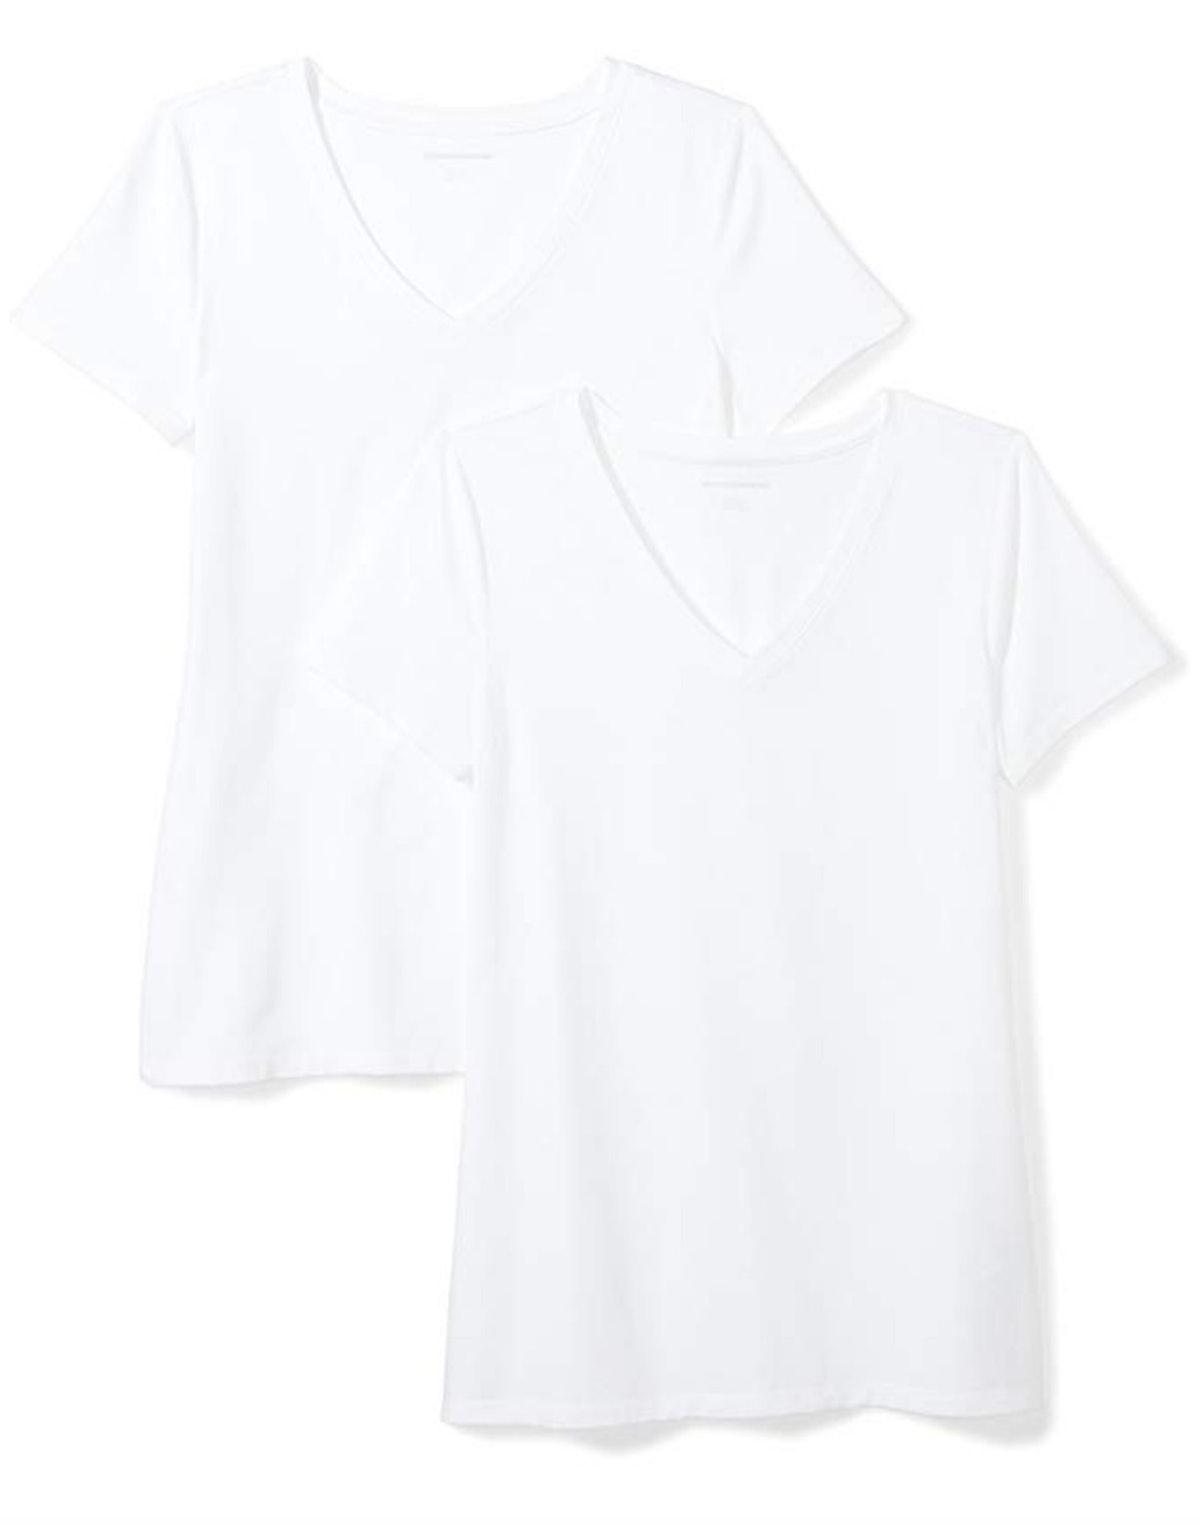 Amazon Essentials Short-Sleeve V-Neck (2-Pack)